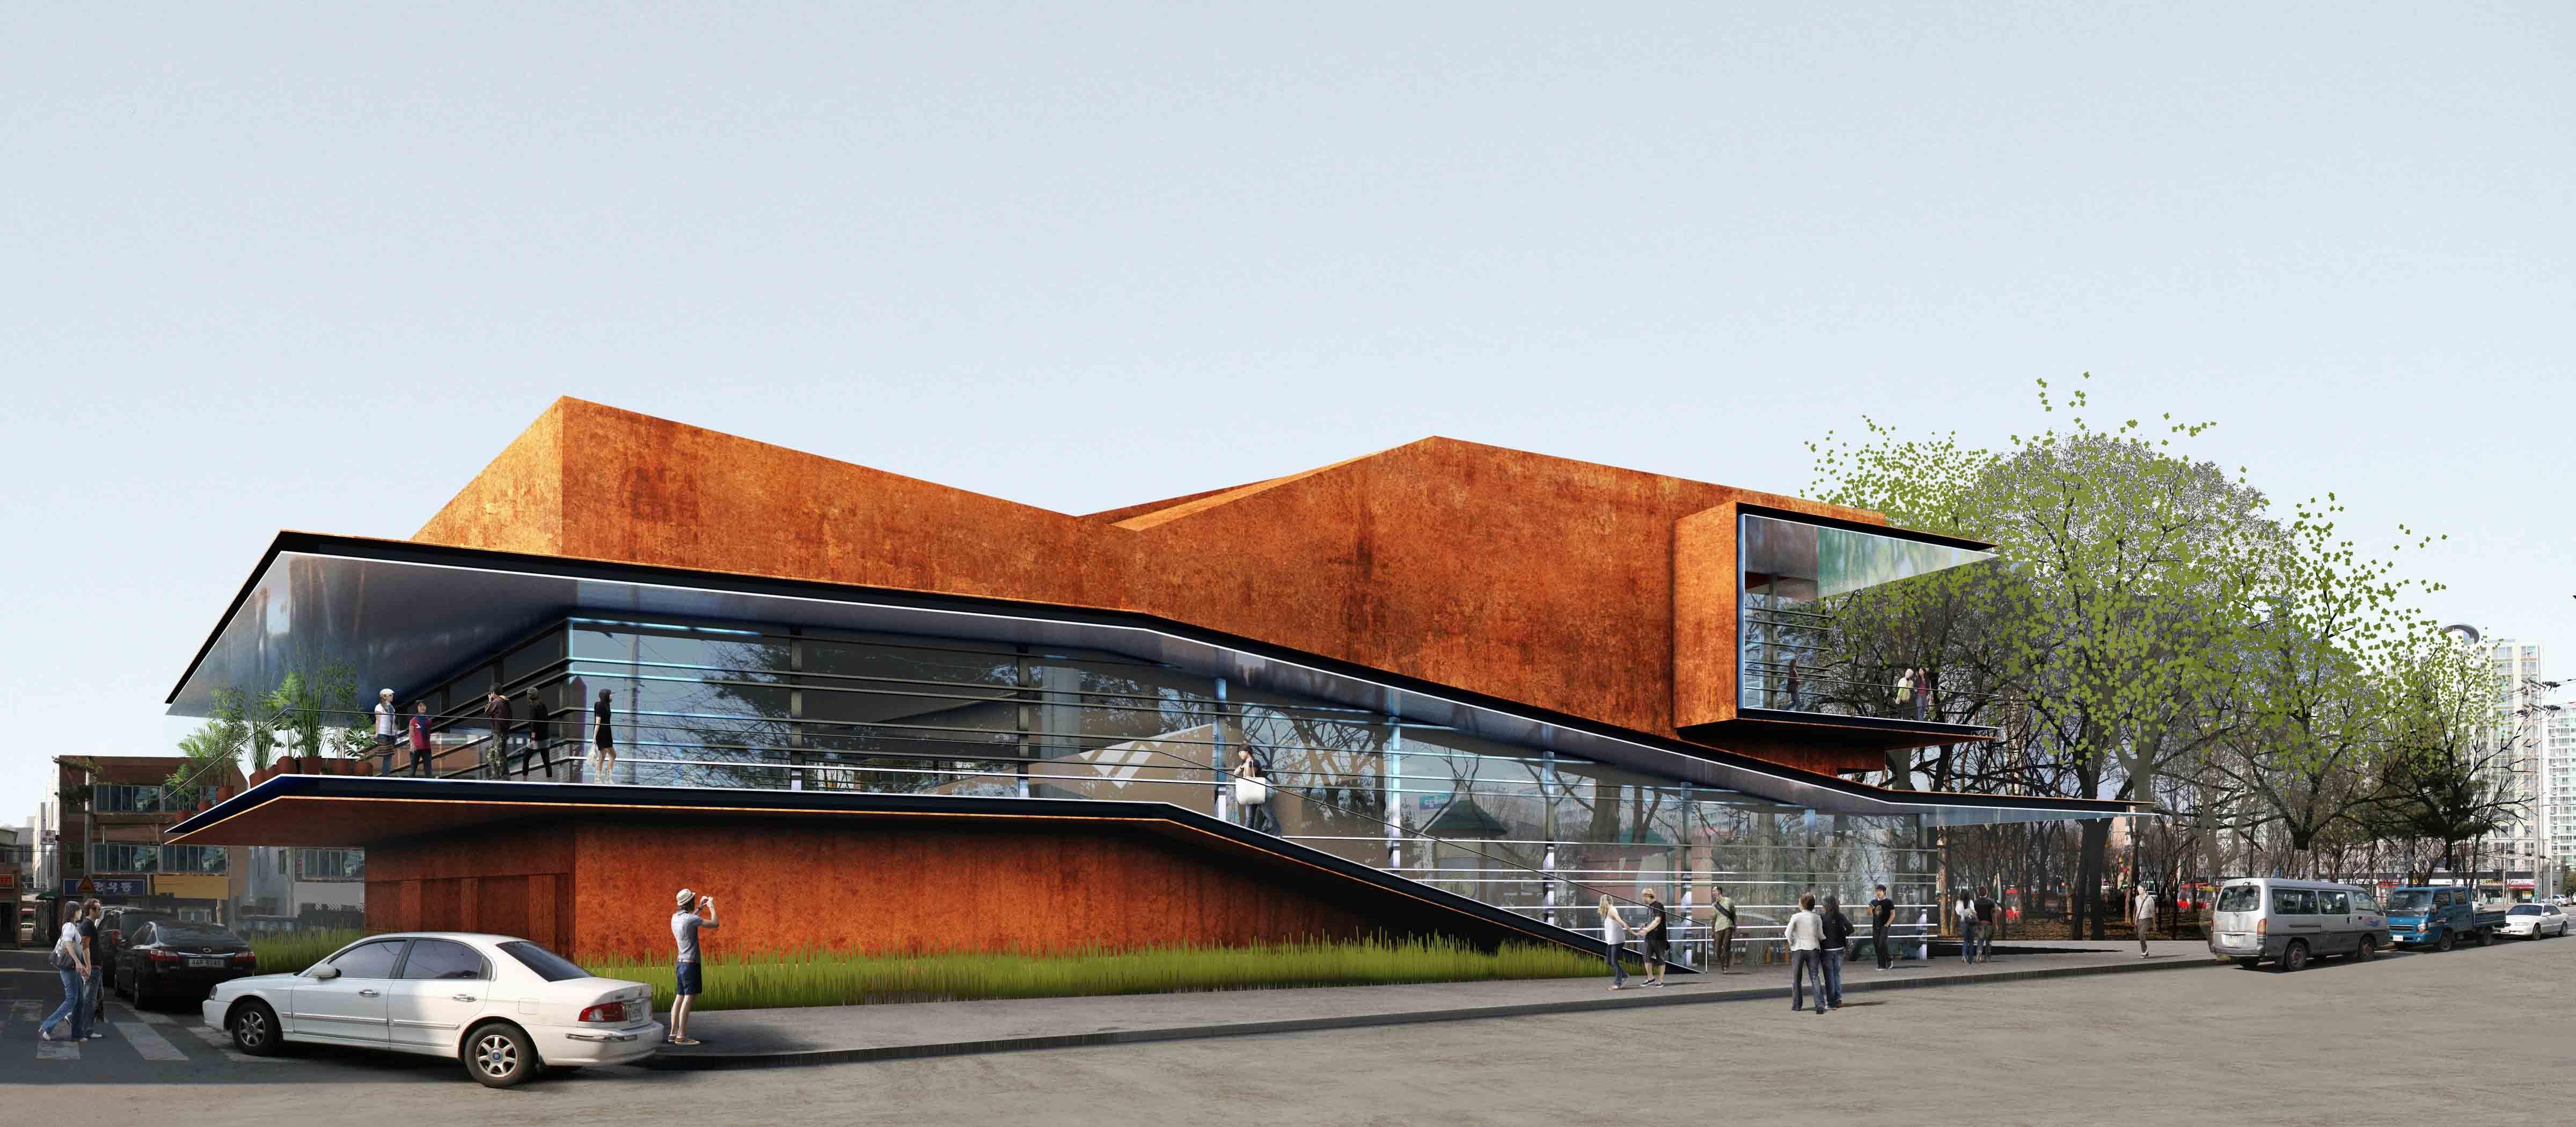 Public library architectural